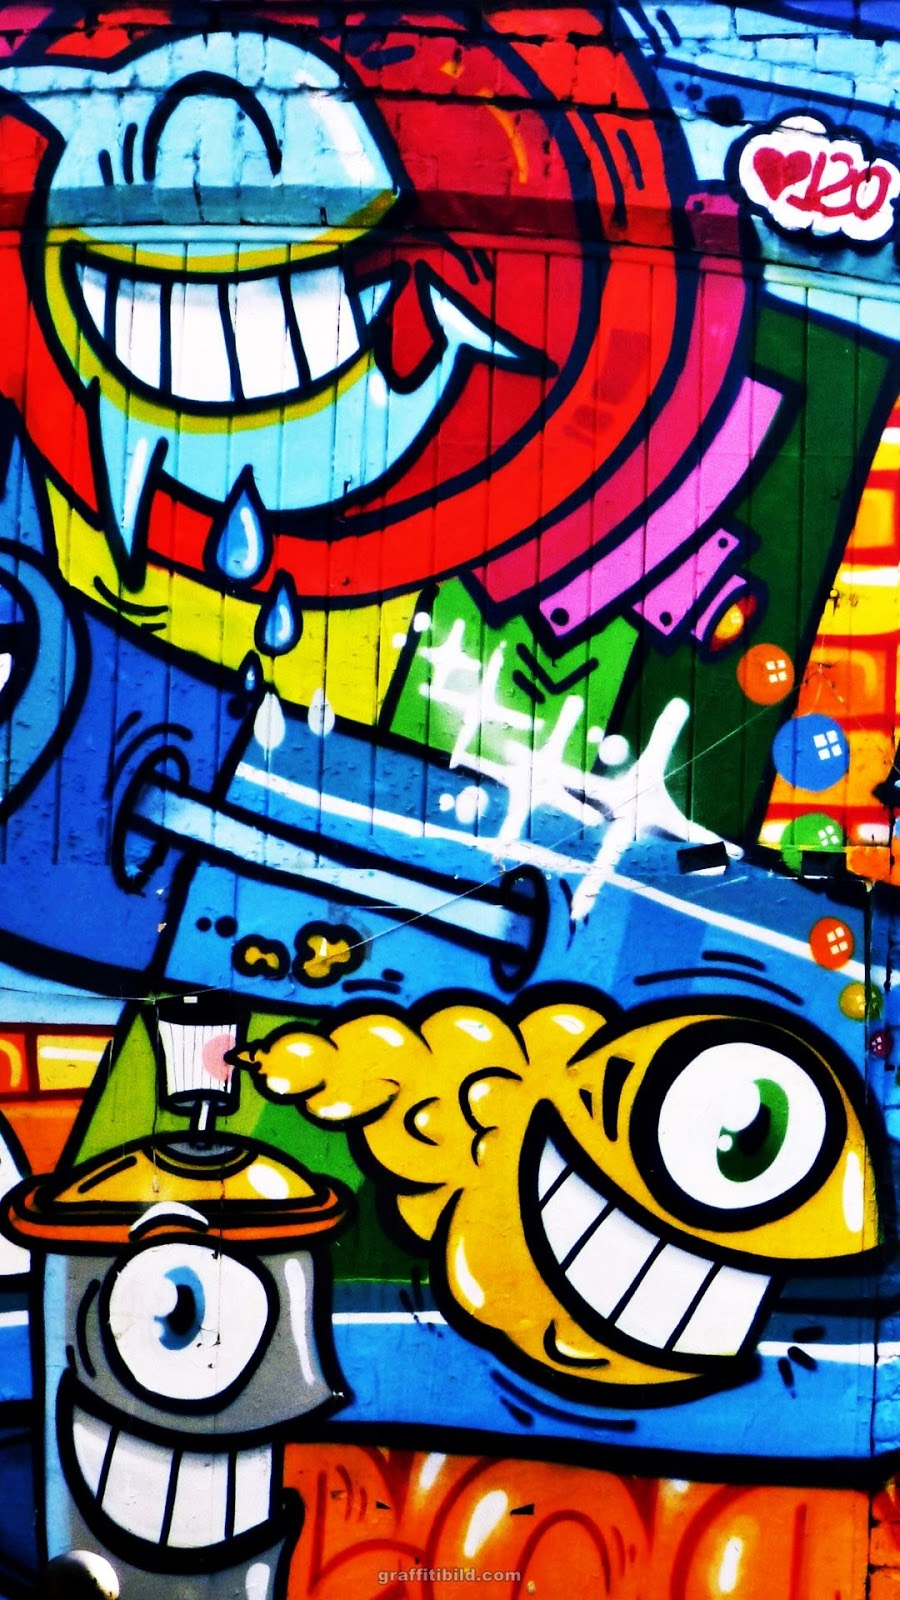 Graffiti, wallpapers, street art, background, Hintergründe, for mobile